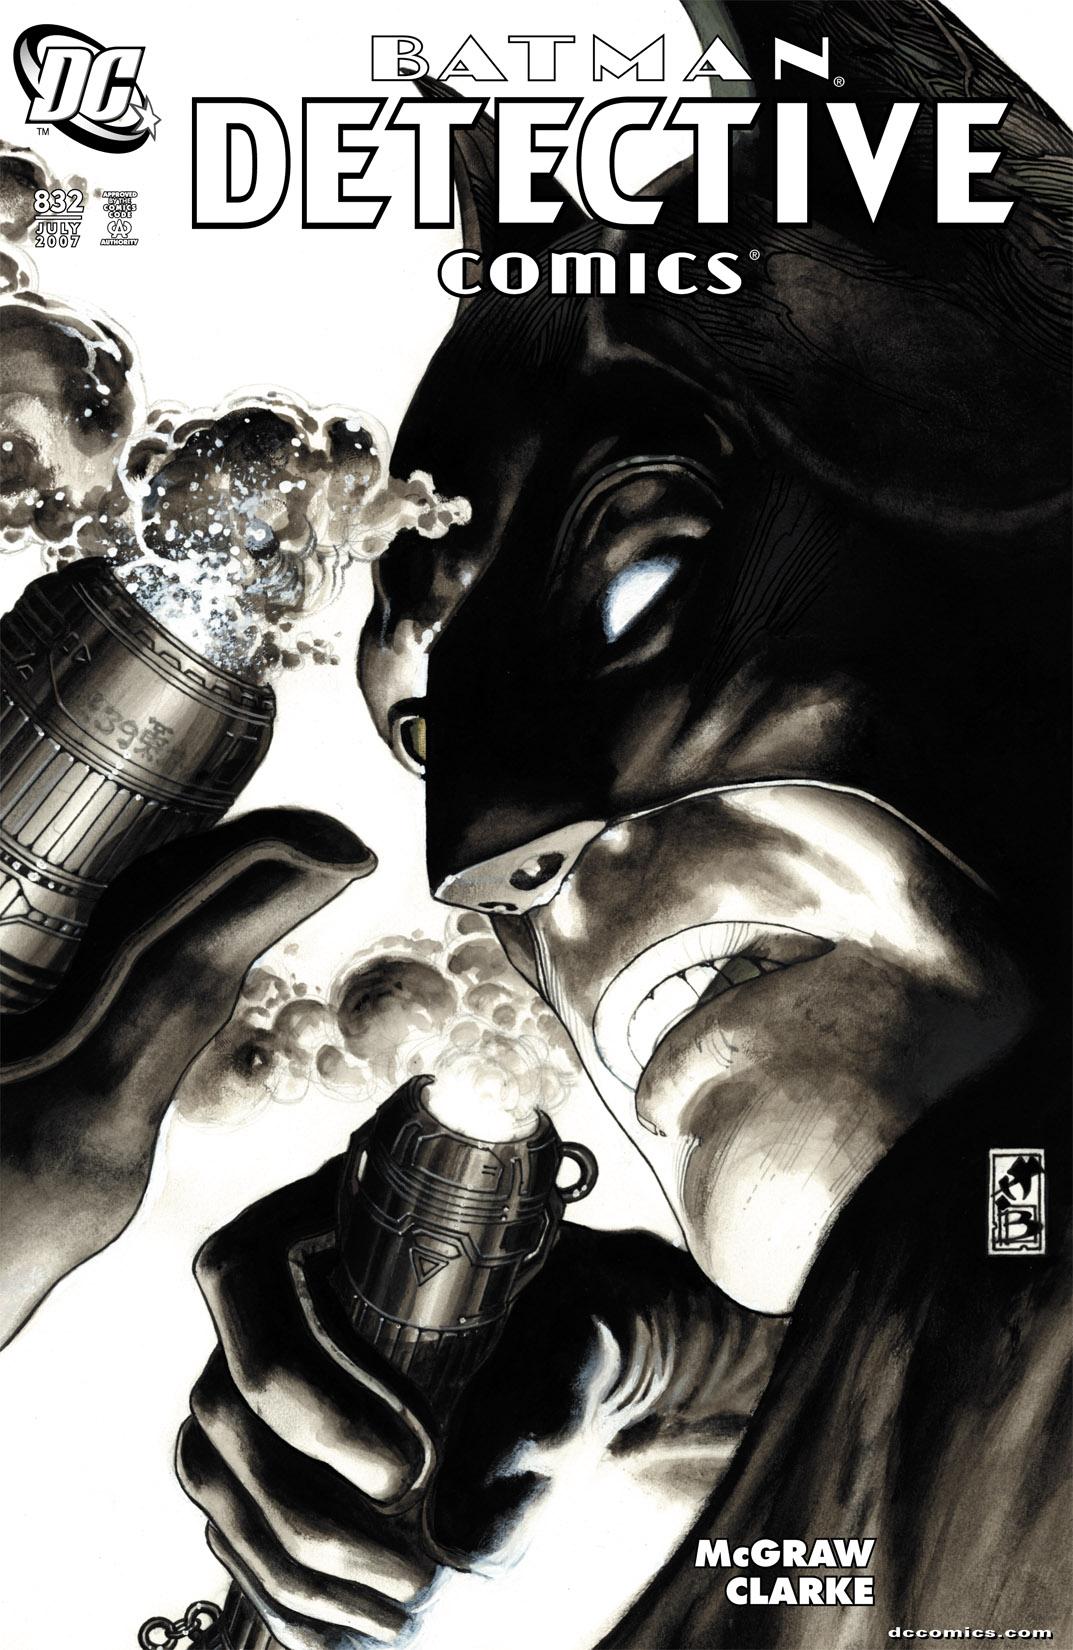 Detective Comics (1937) 832 Page 1